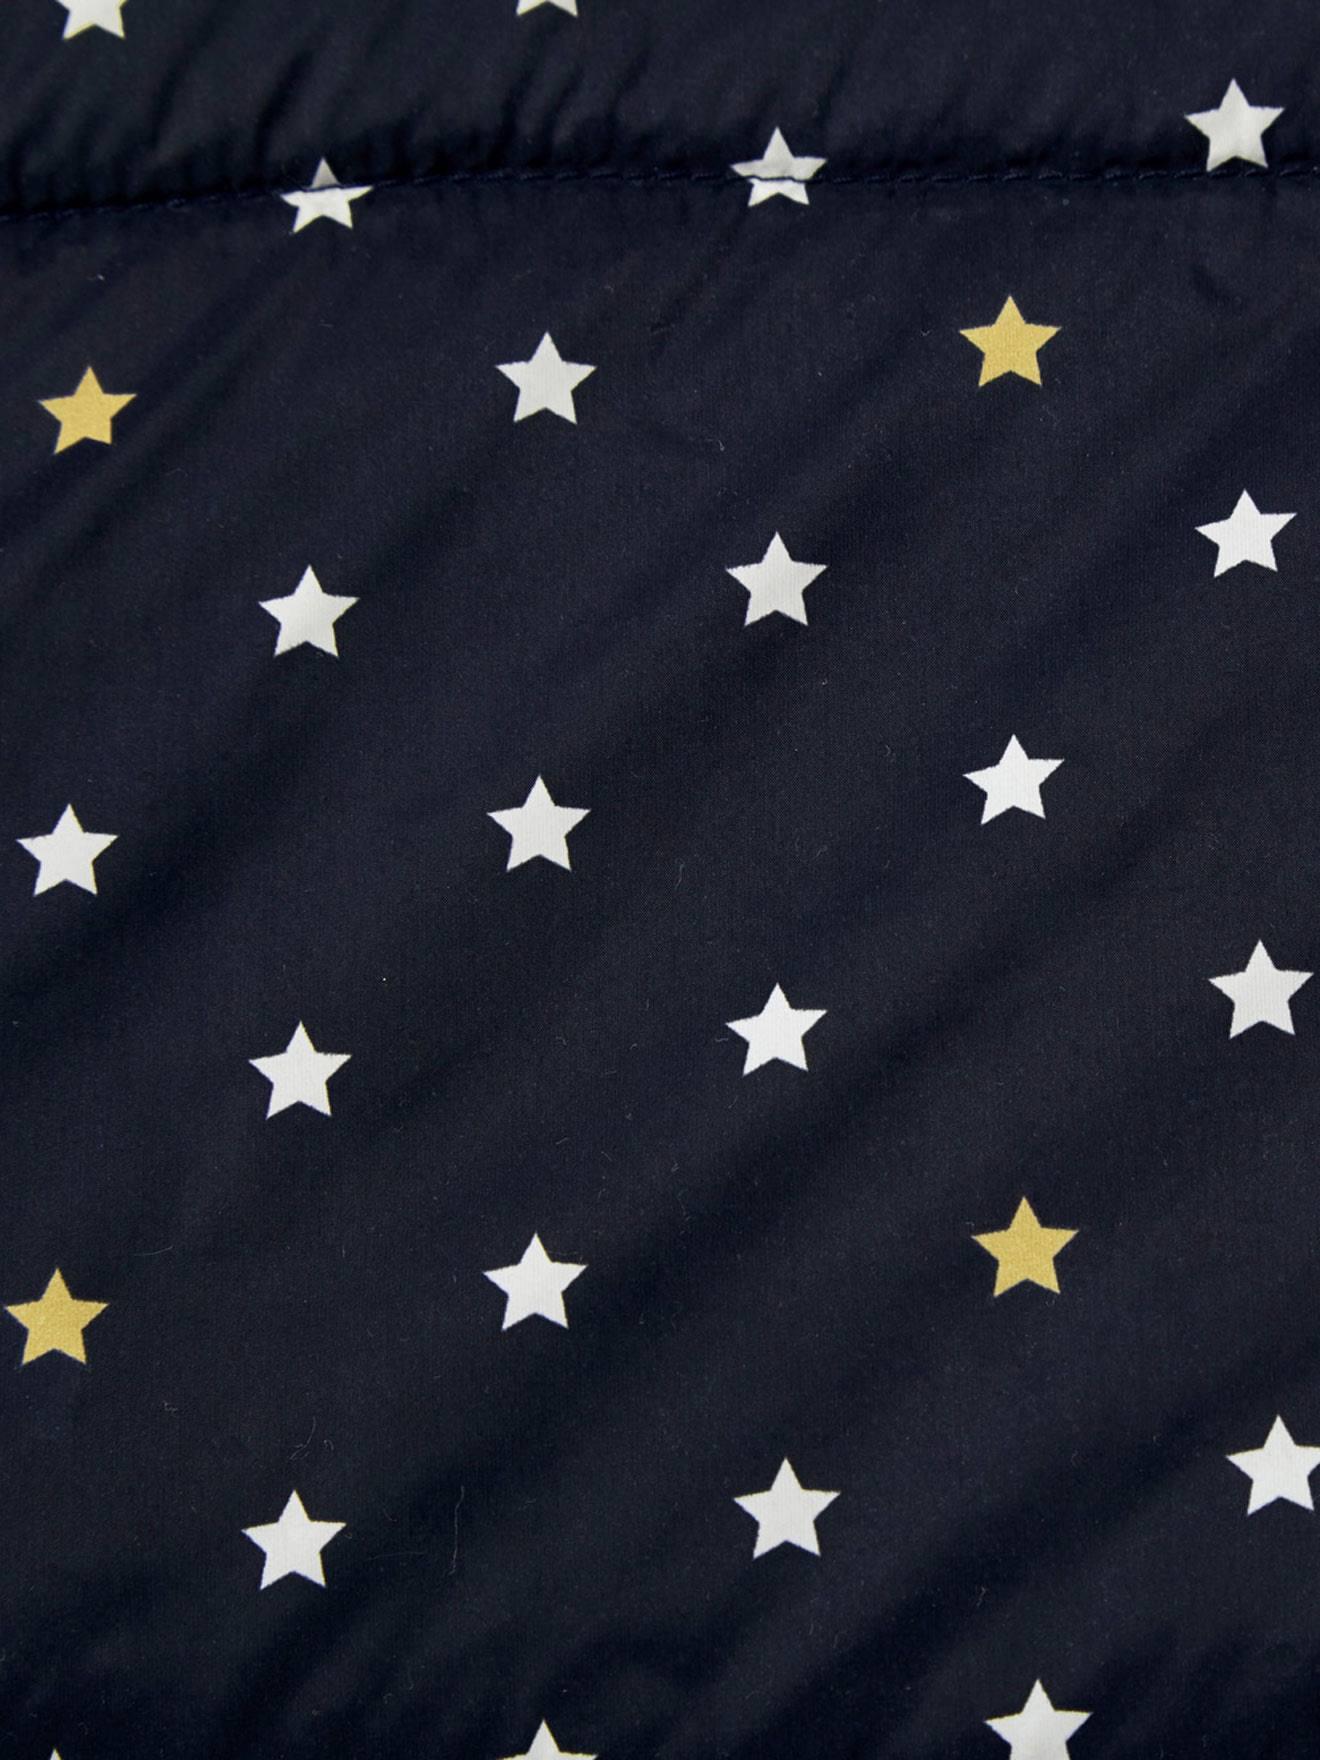 Sterne. Interesting Magic Sterne Schweif Glittery With Sterne ...